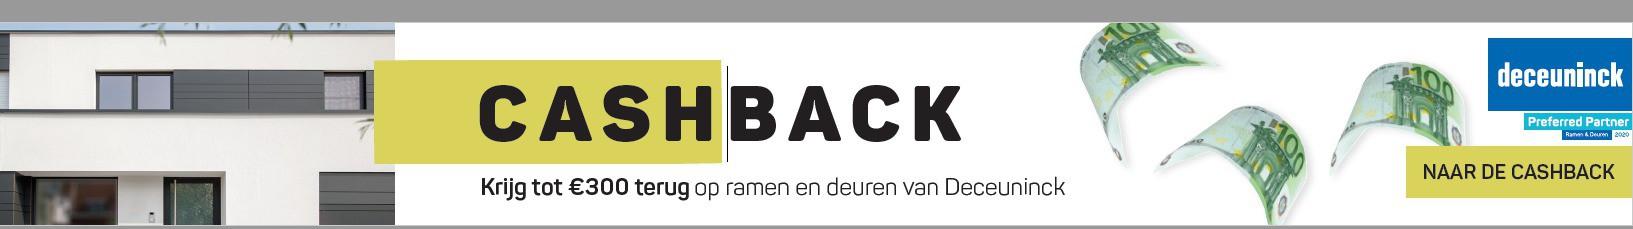 Cashback Deceuninck